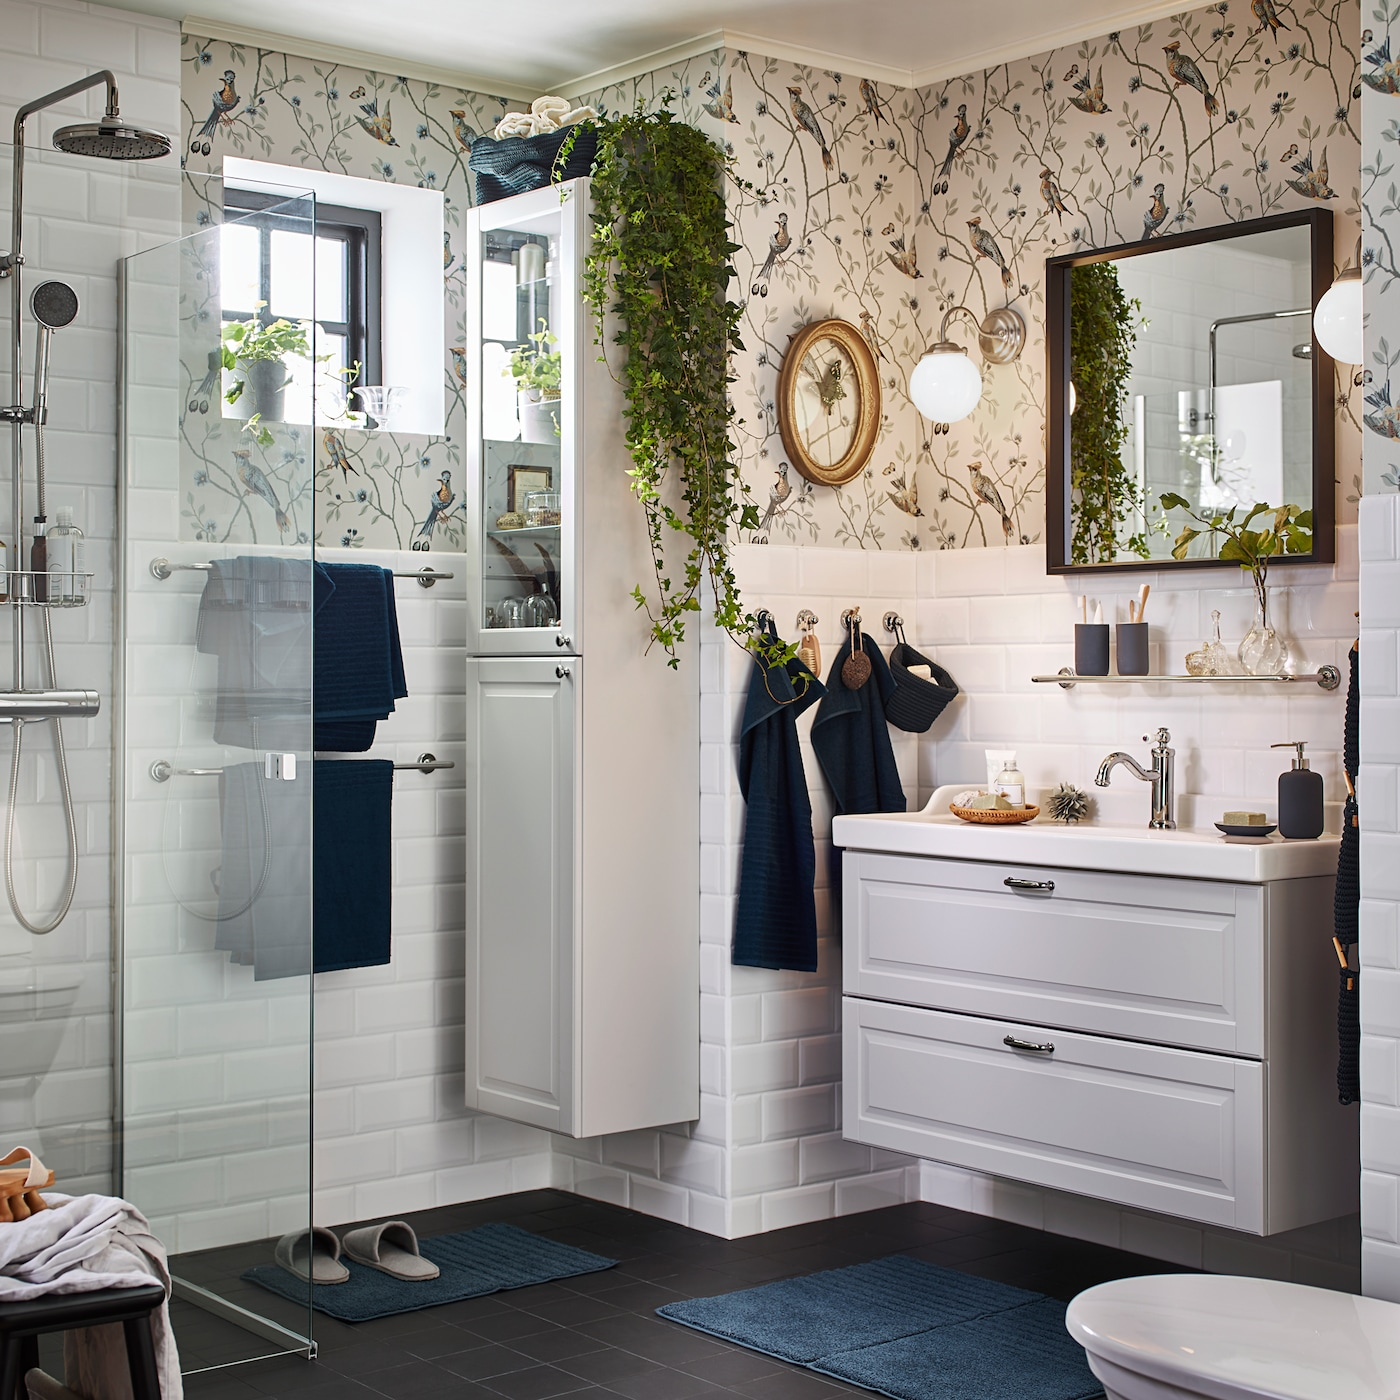 buy bathroom furniture accessories online ikea uae ikea rh ikea com